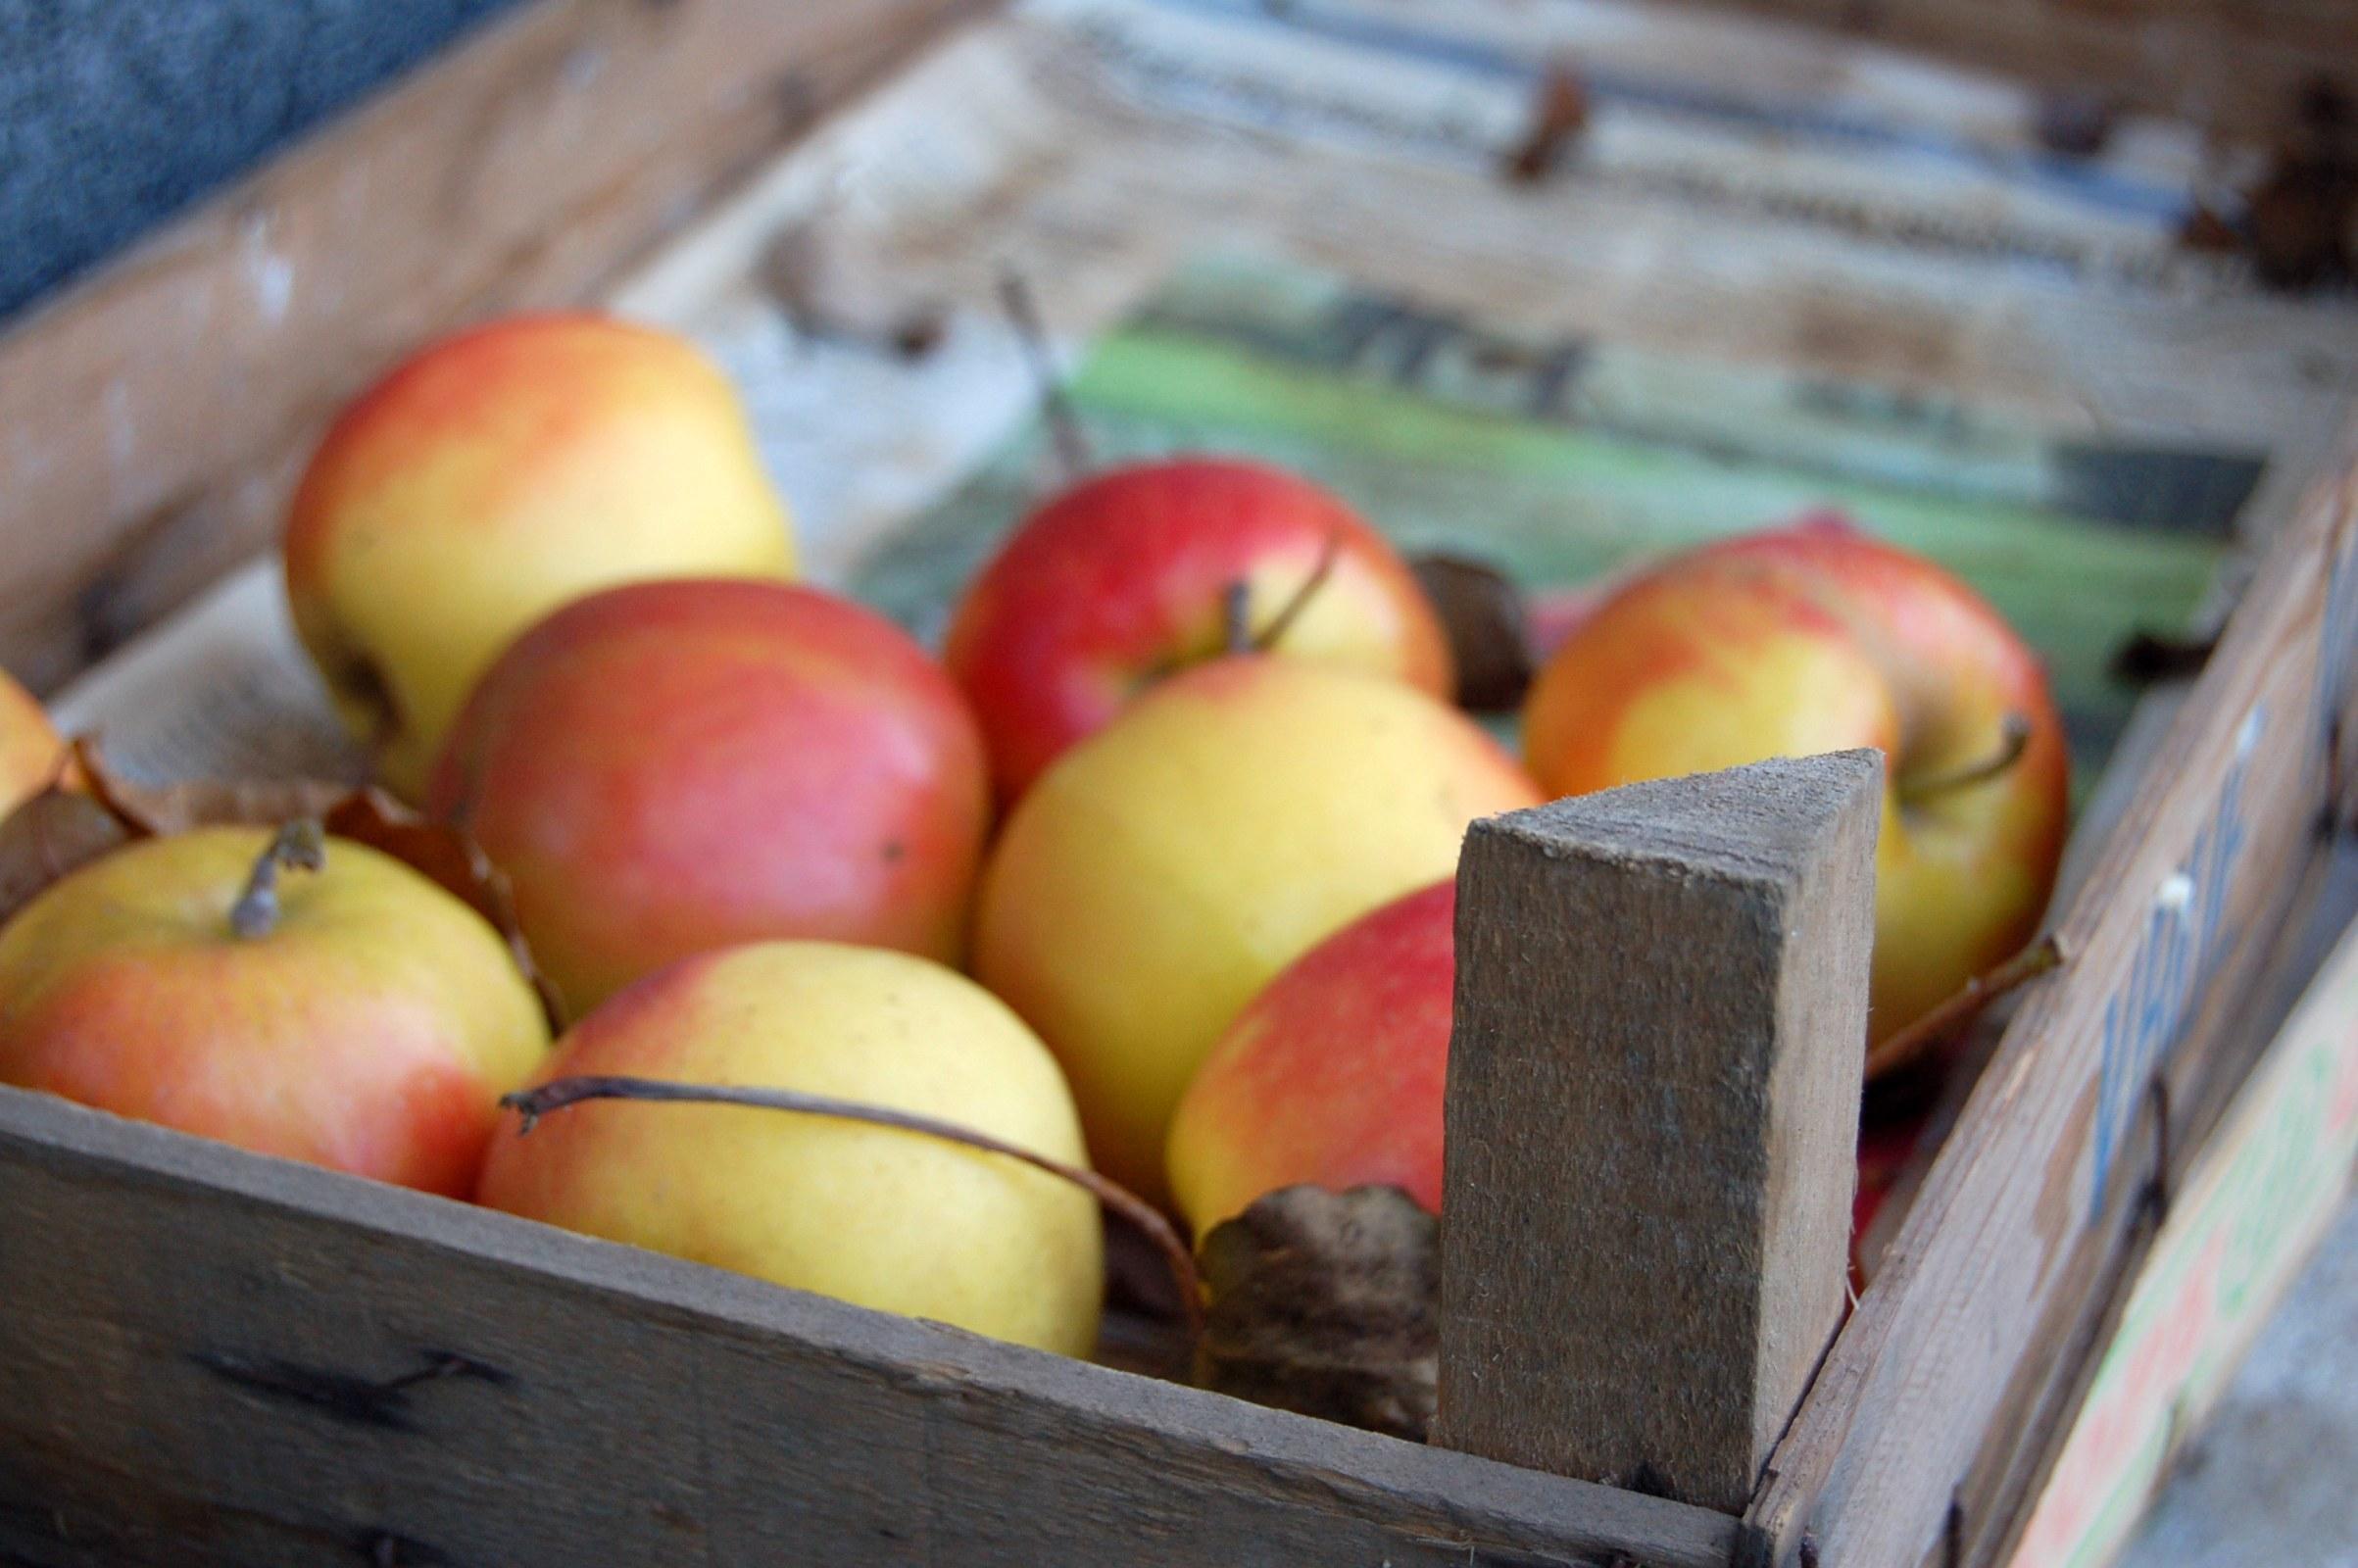 яблоки в коробке